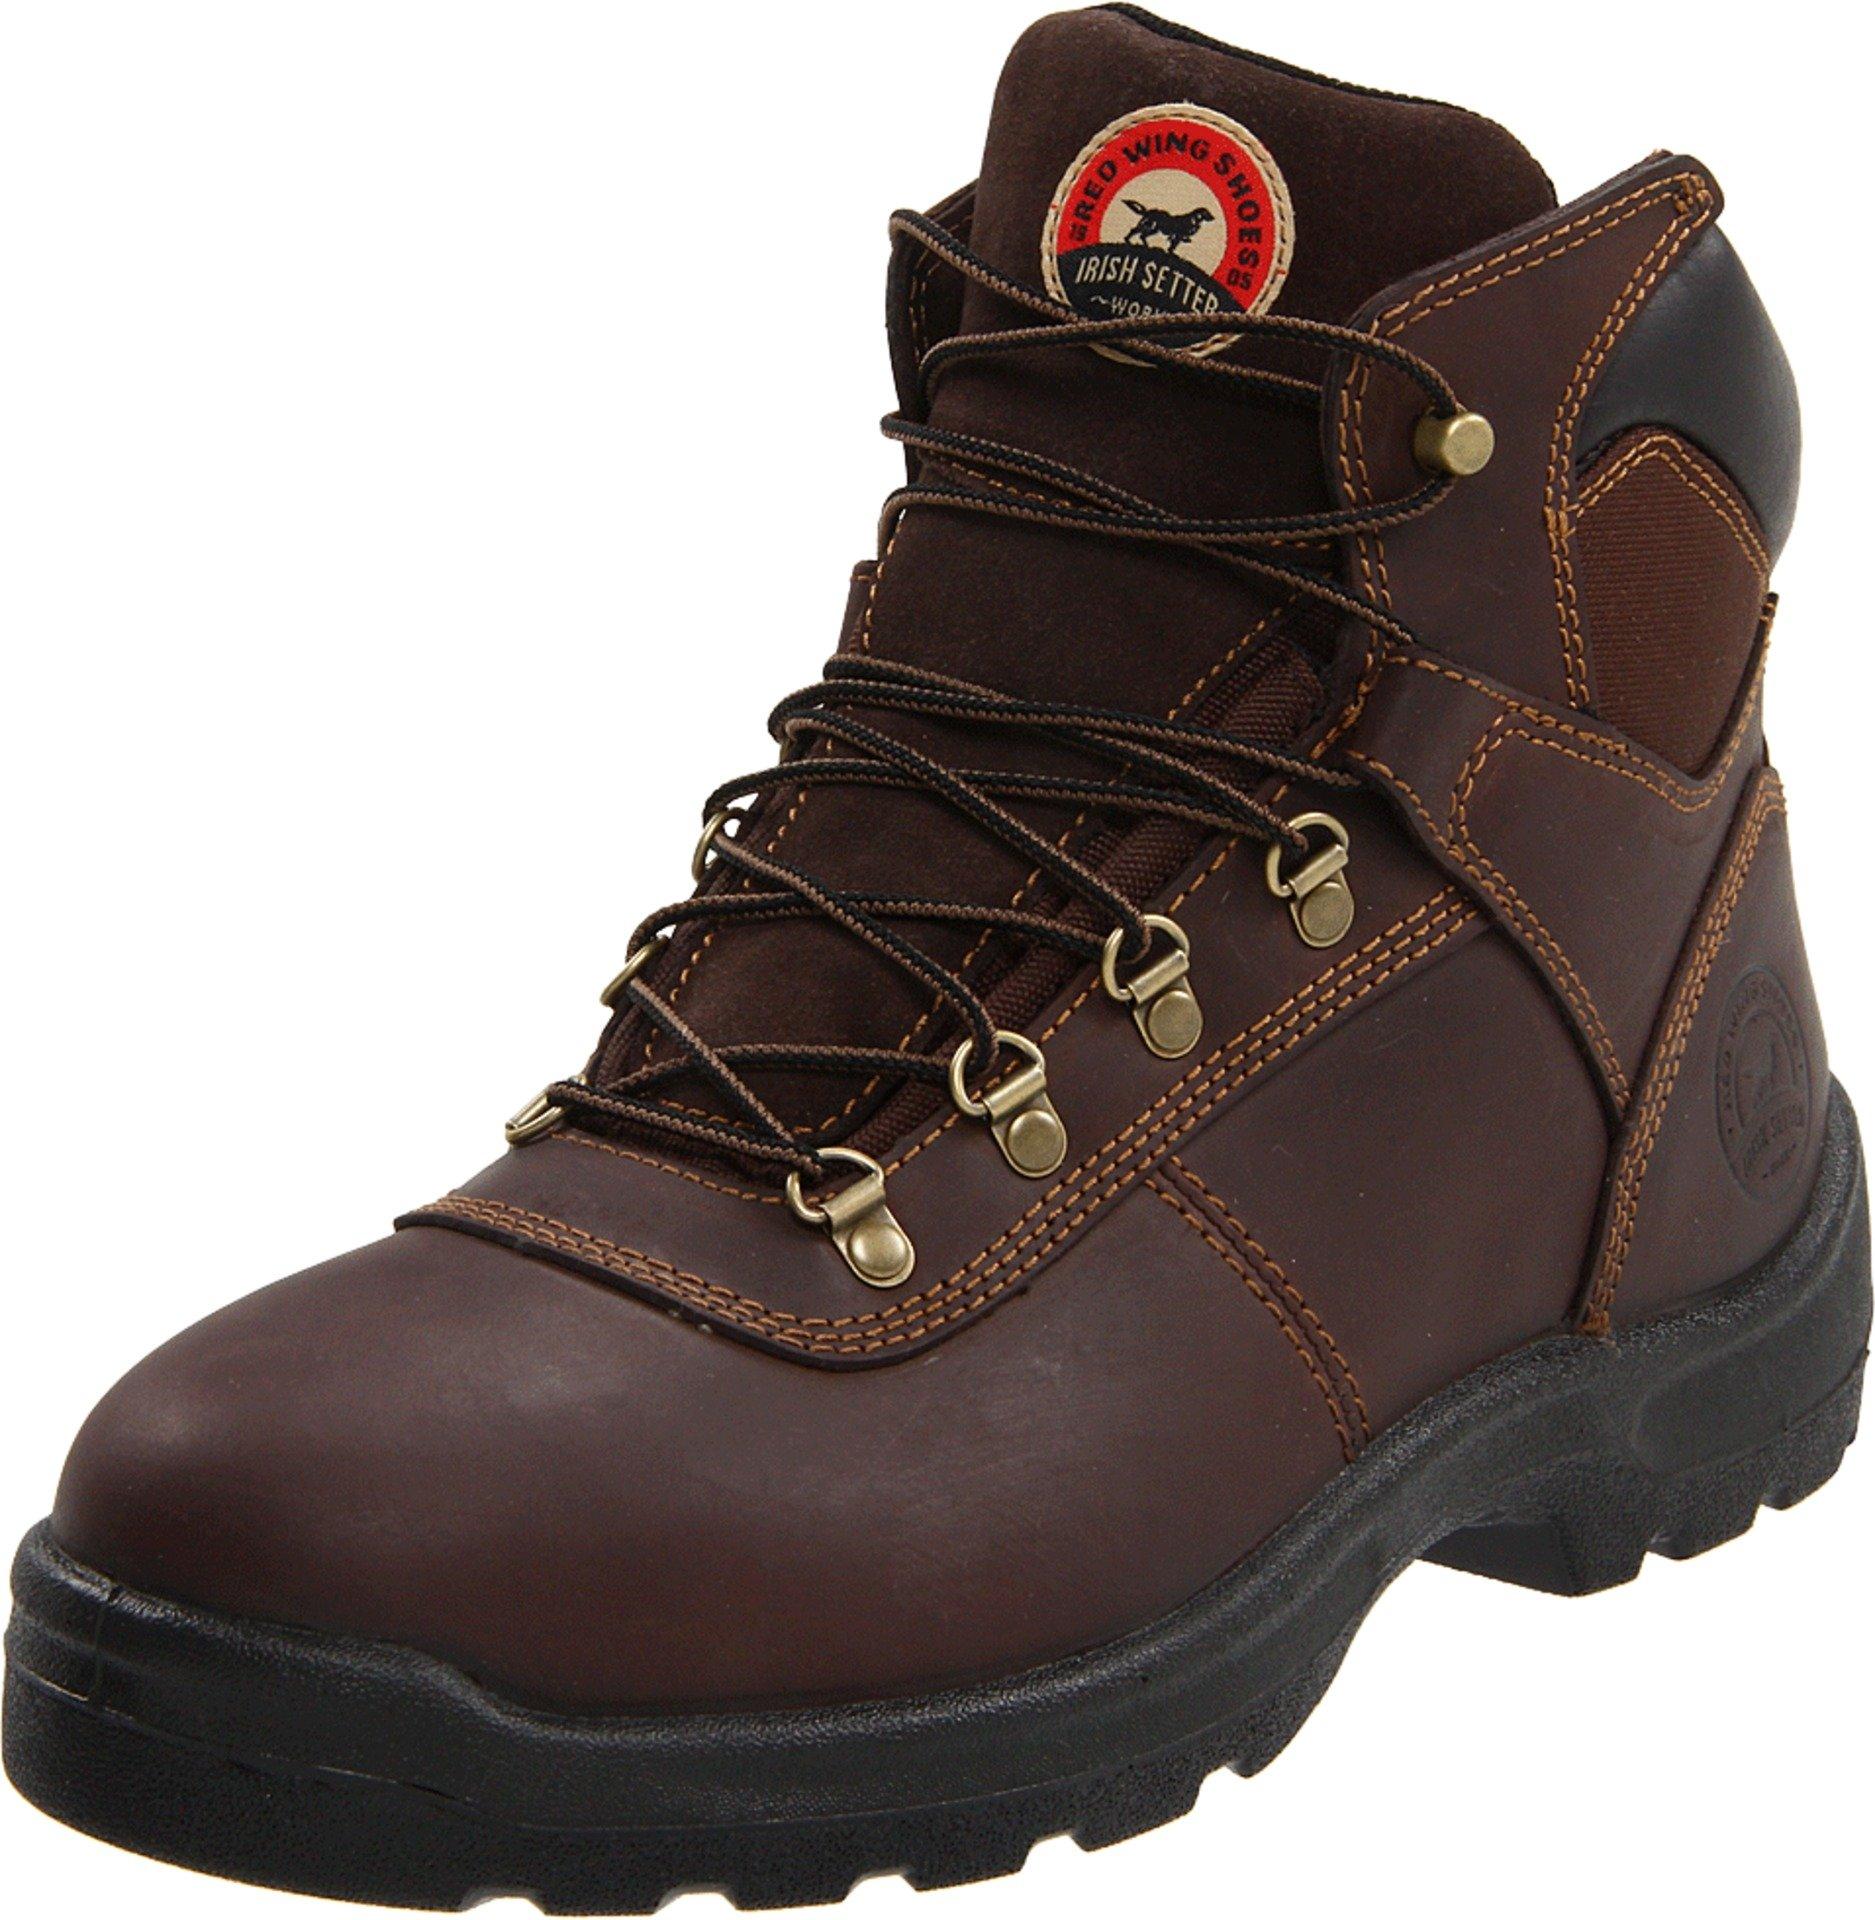 "Irish Setter Men's Ely 6"" 83607 Work Boot,Brown,7 D"